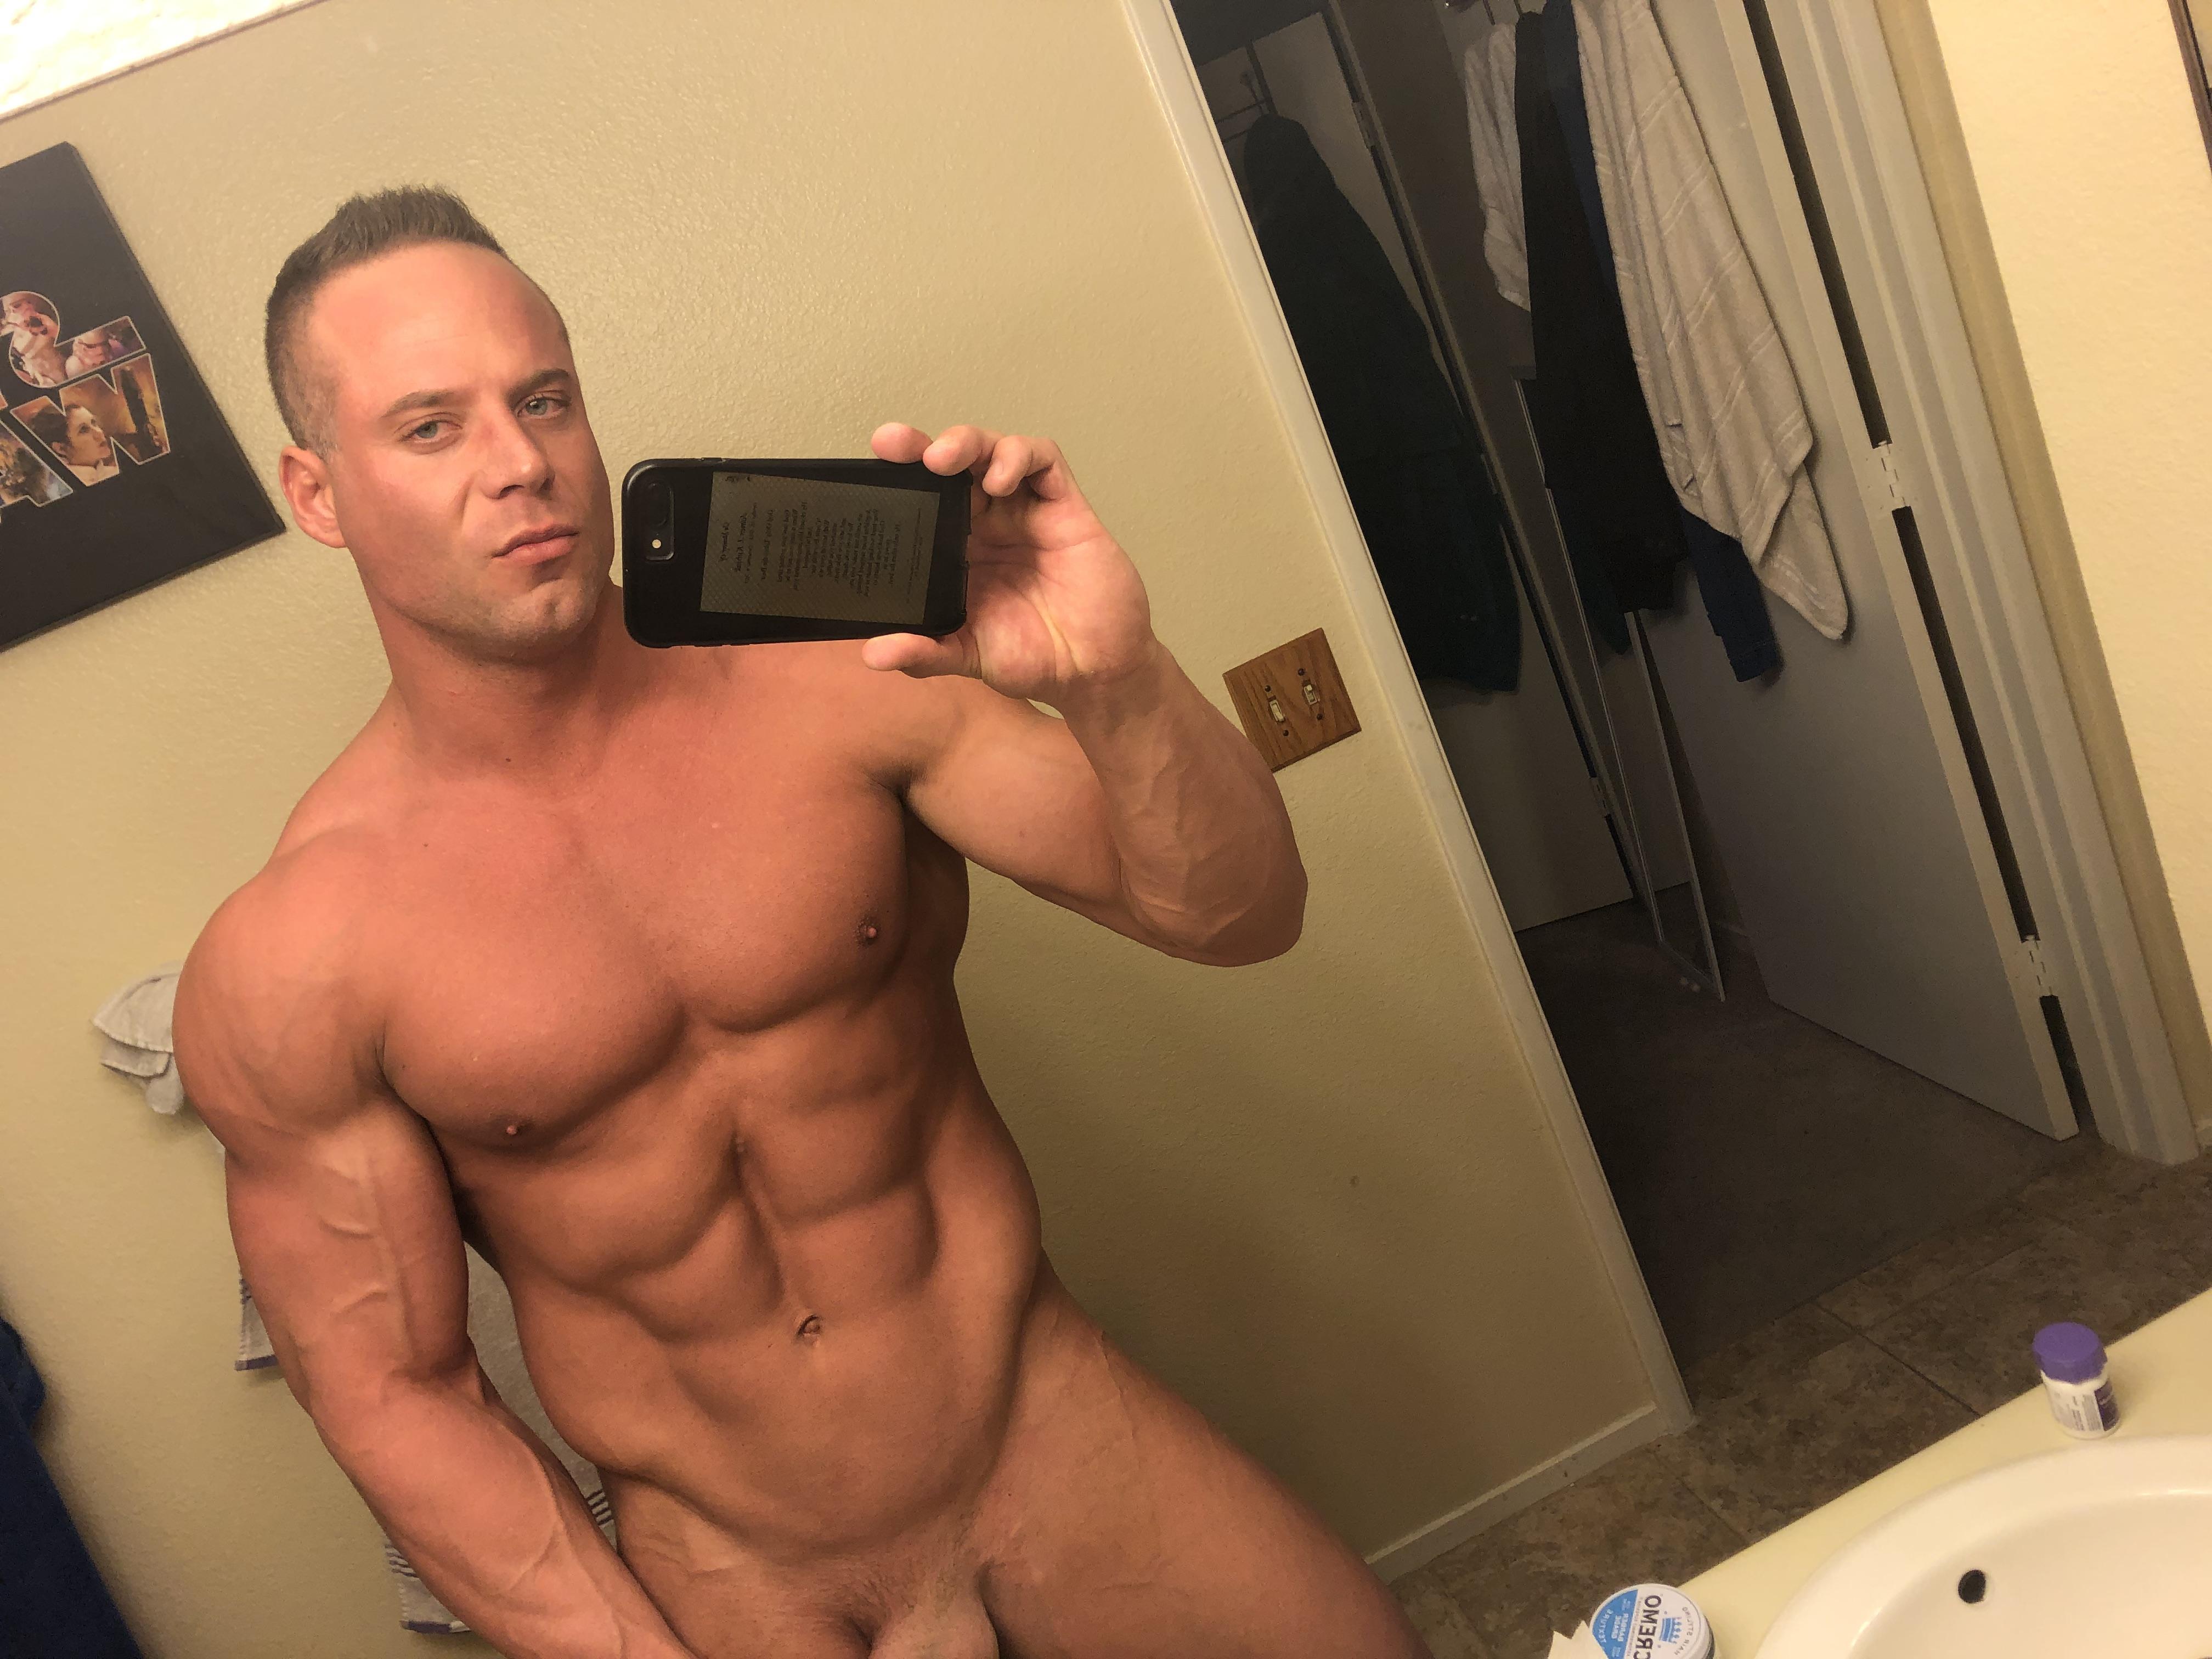 sean cody jack gay porn